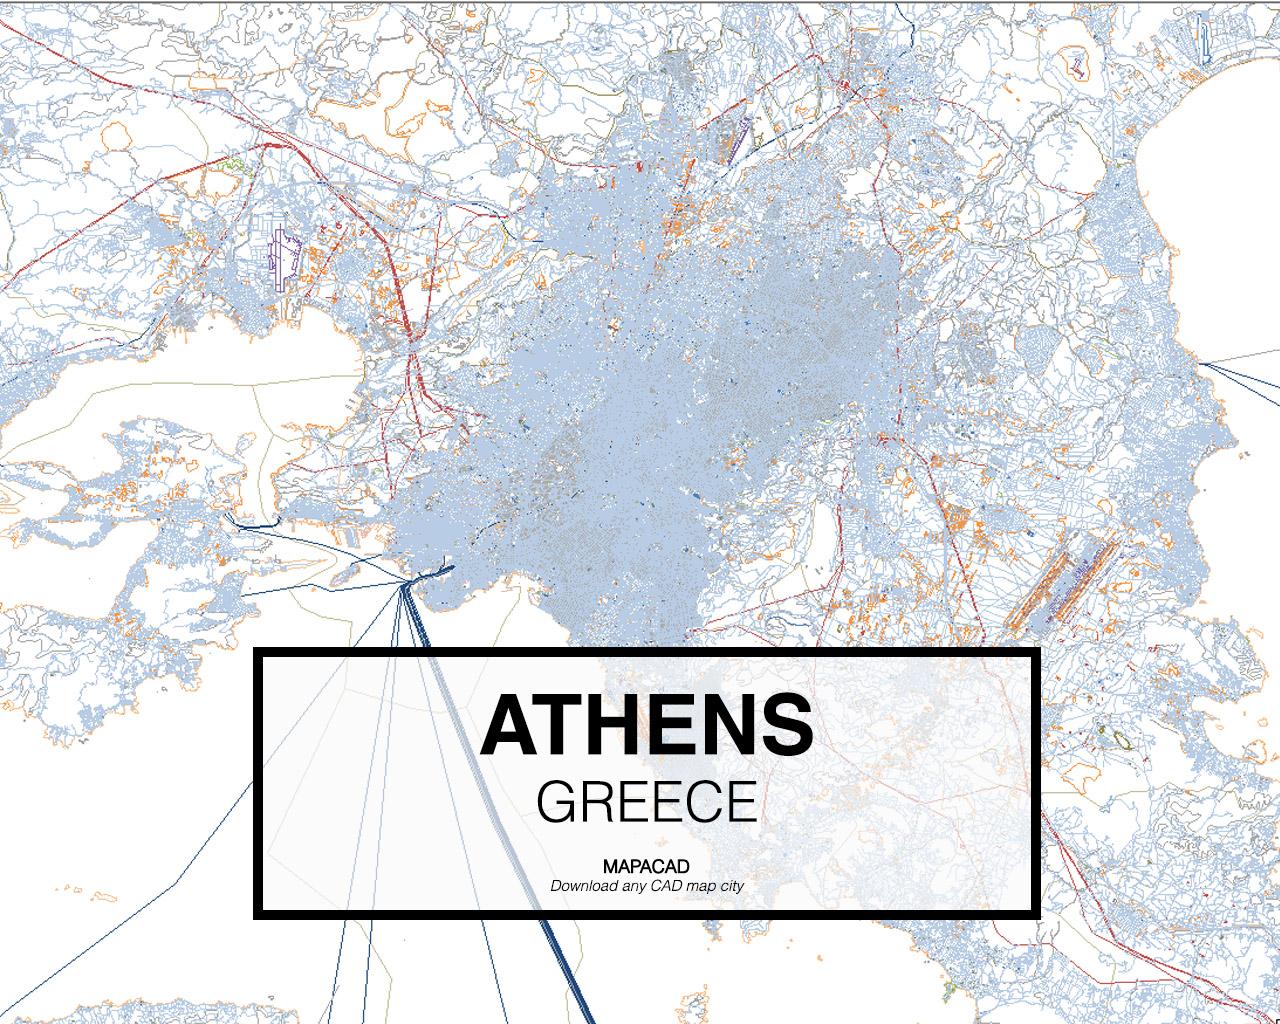 Athens Dwg Mapacad